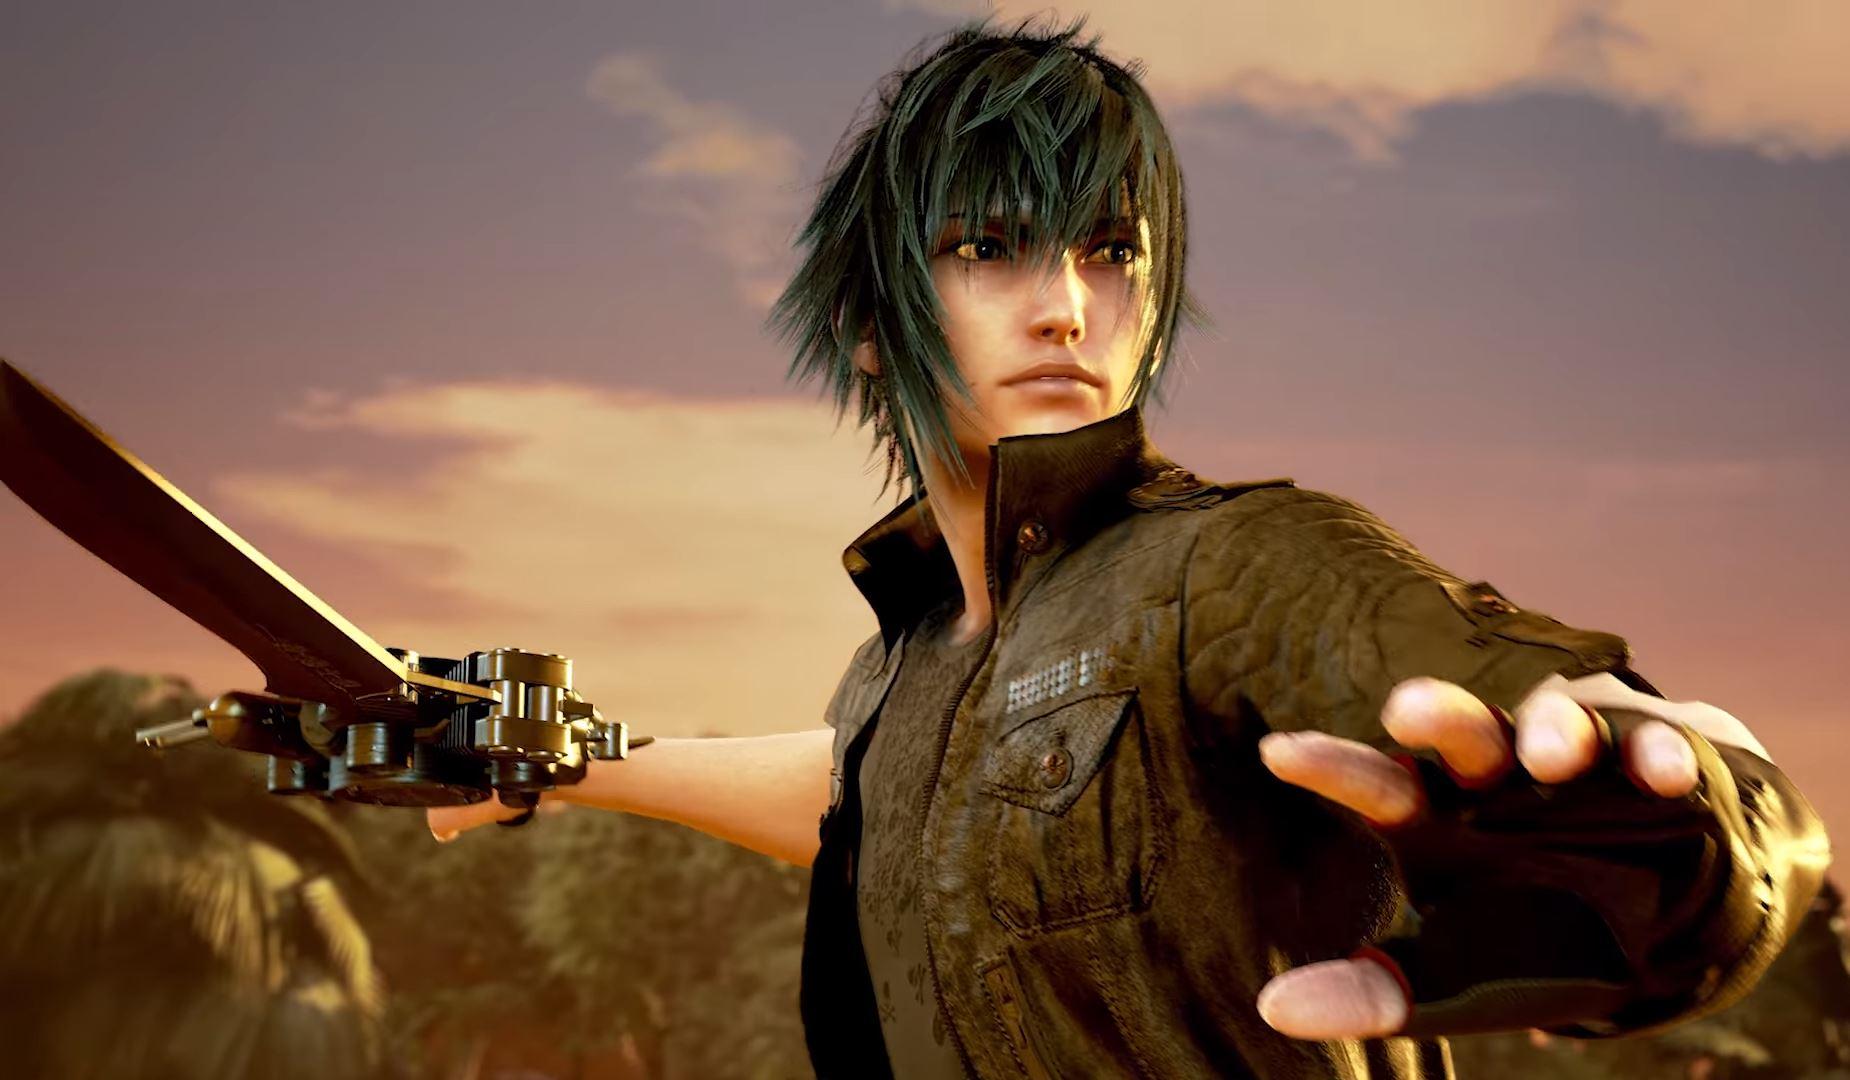 Tekken 7 Final Fantasy S Xv S Noctis Joins The Roster Den Of Geek